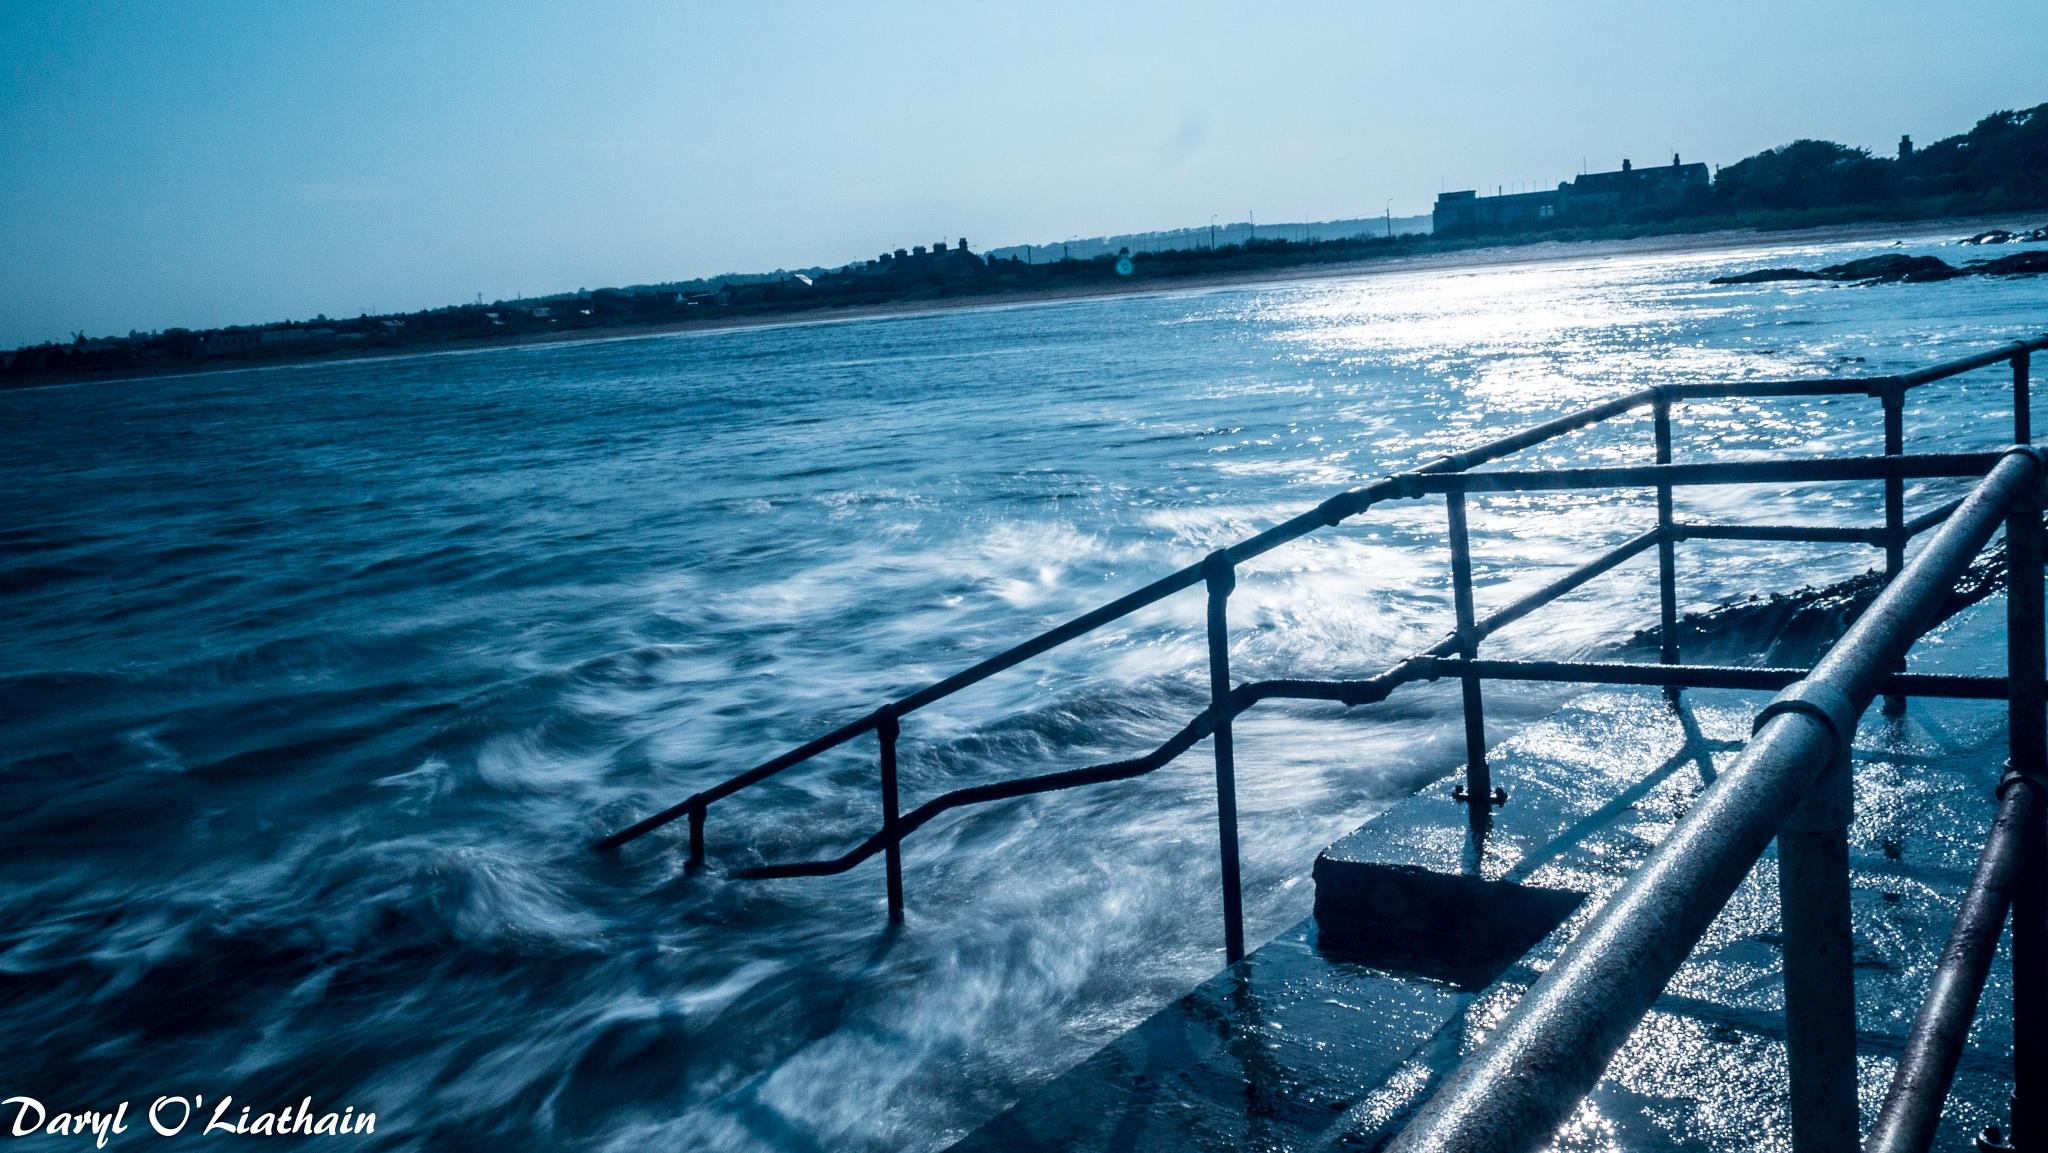 skerries by Daryl O'Liathain